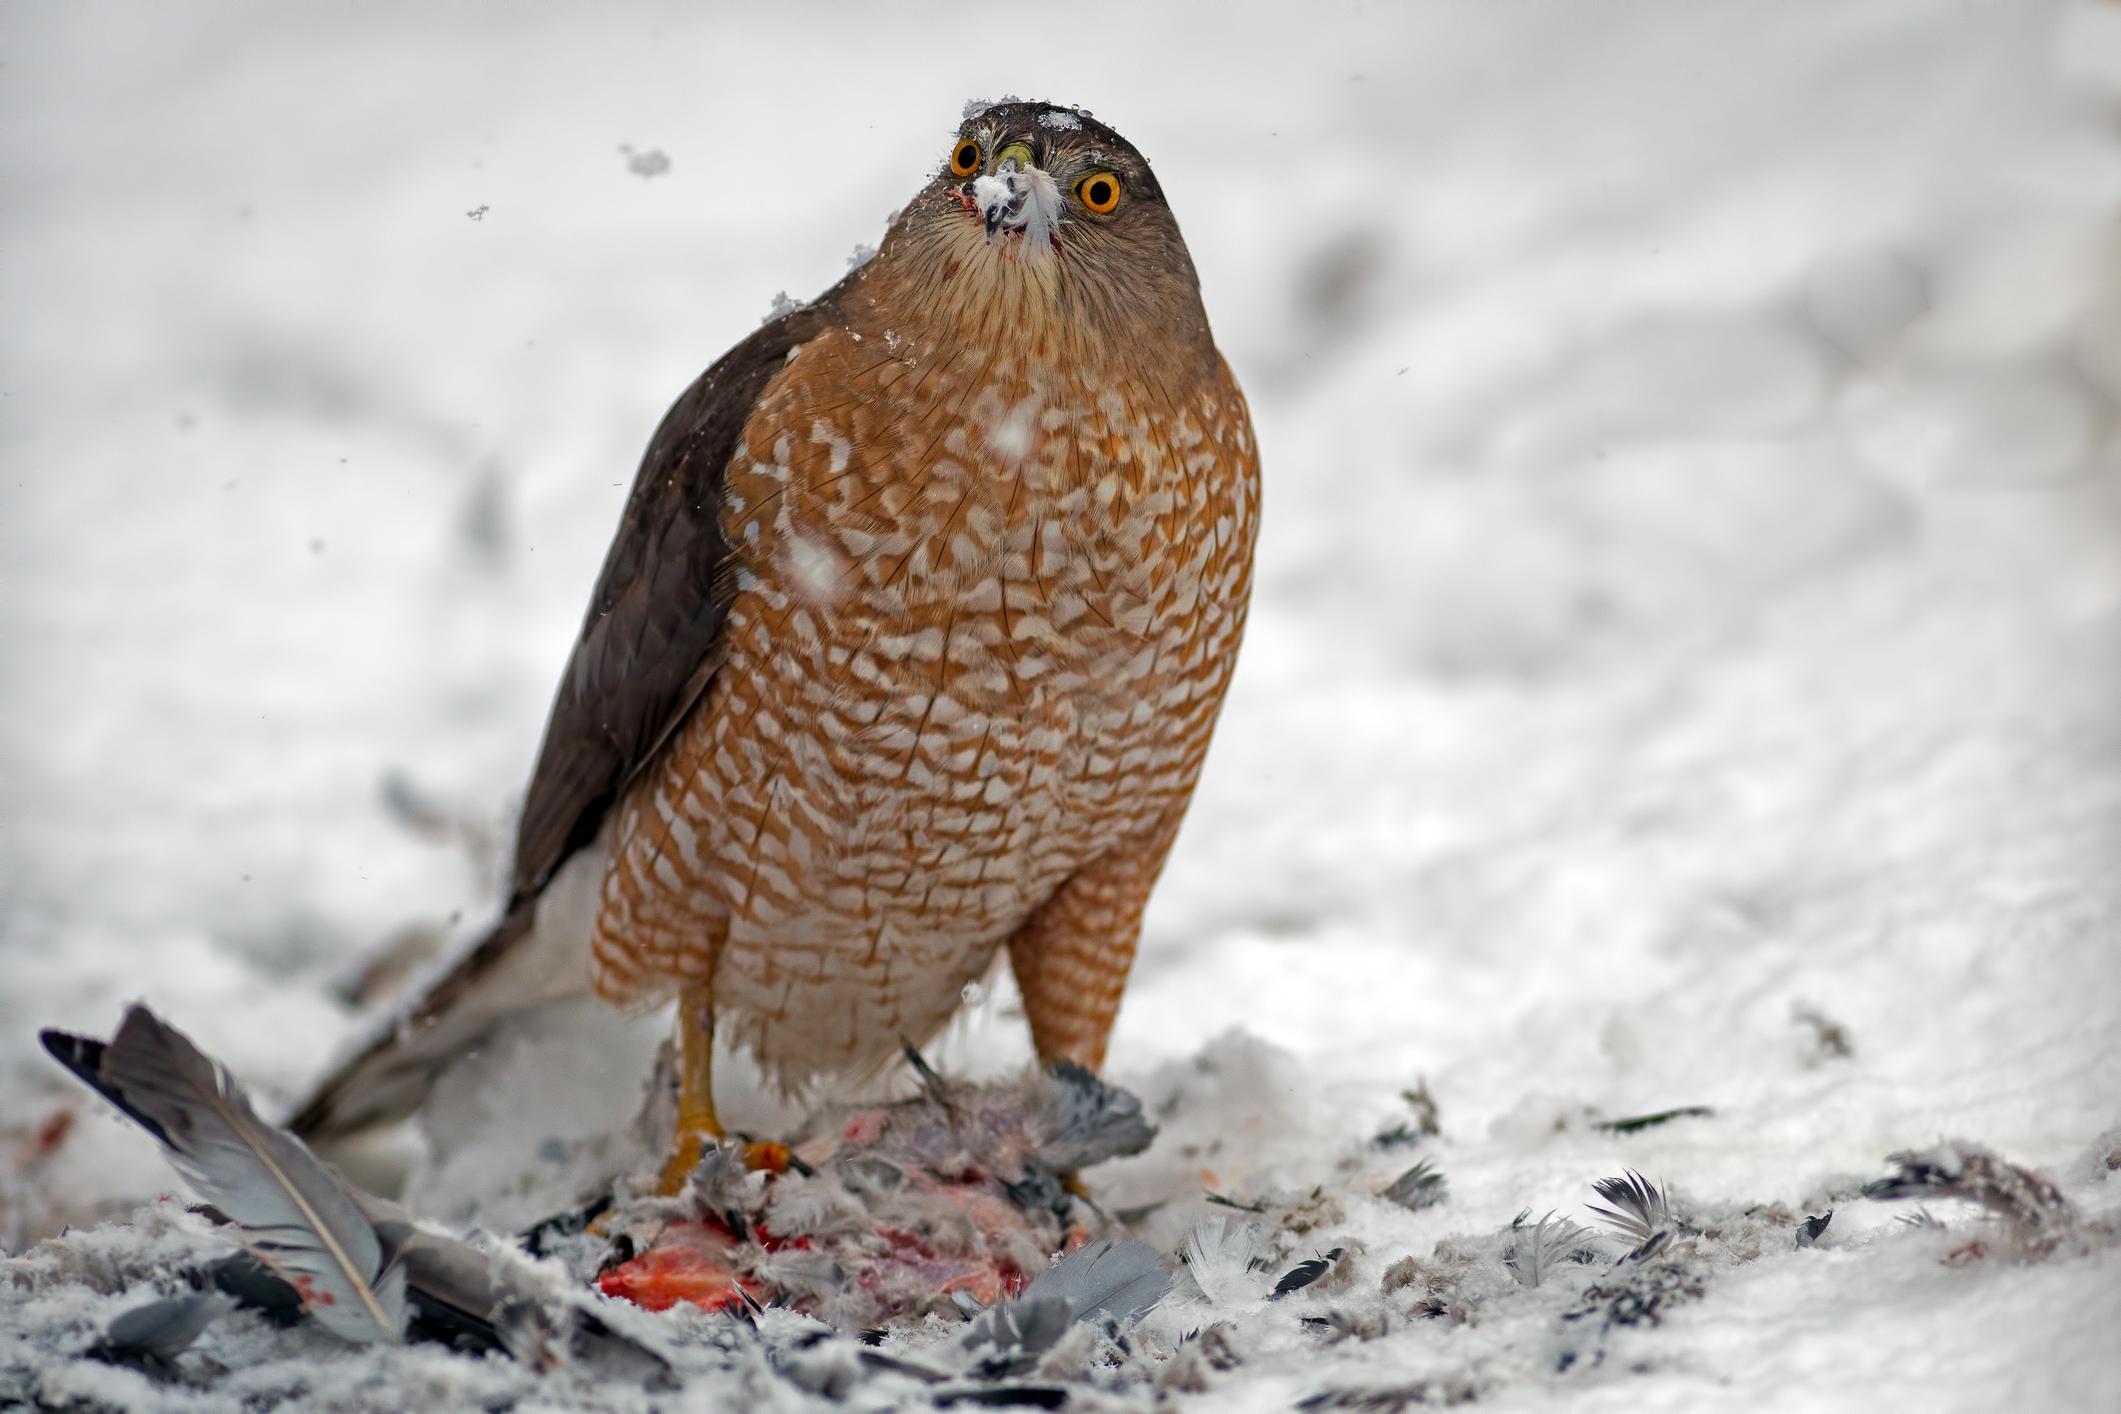 sharp-shinned hawk eating it's prey